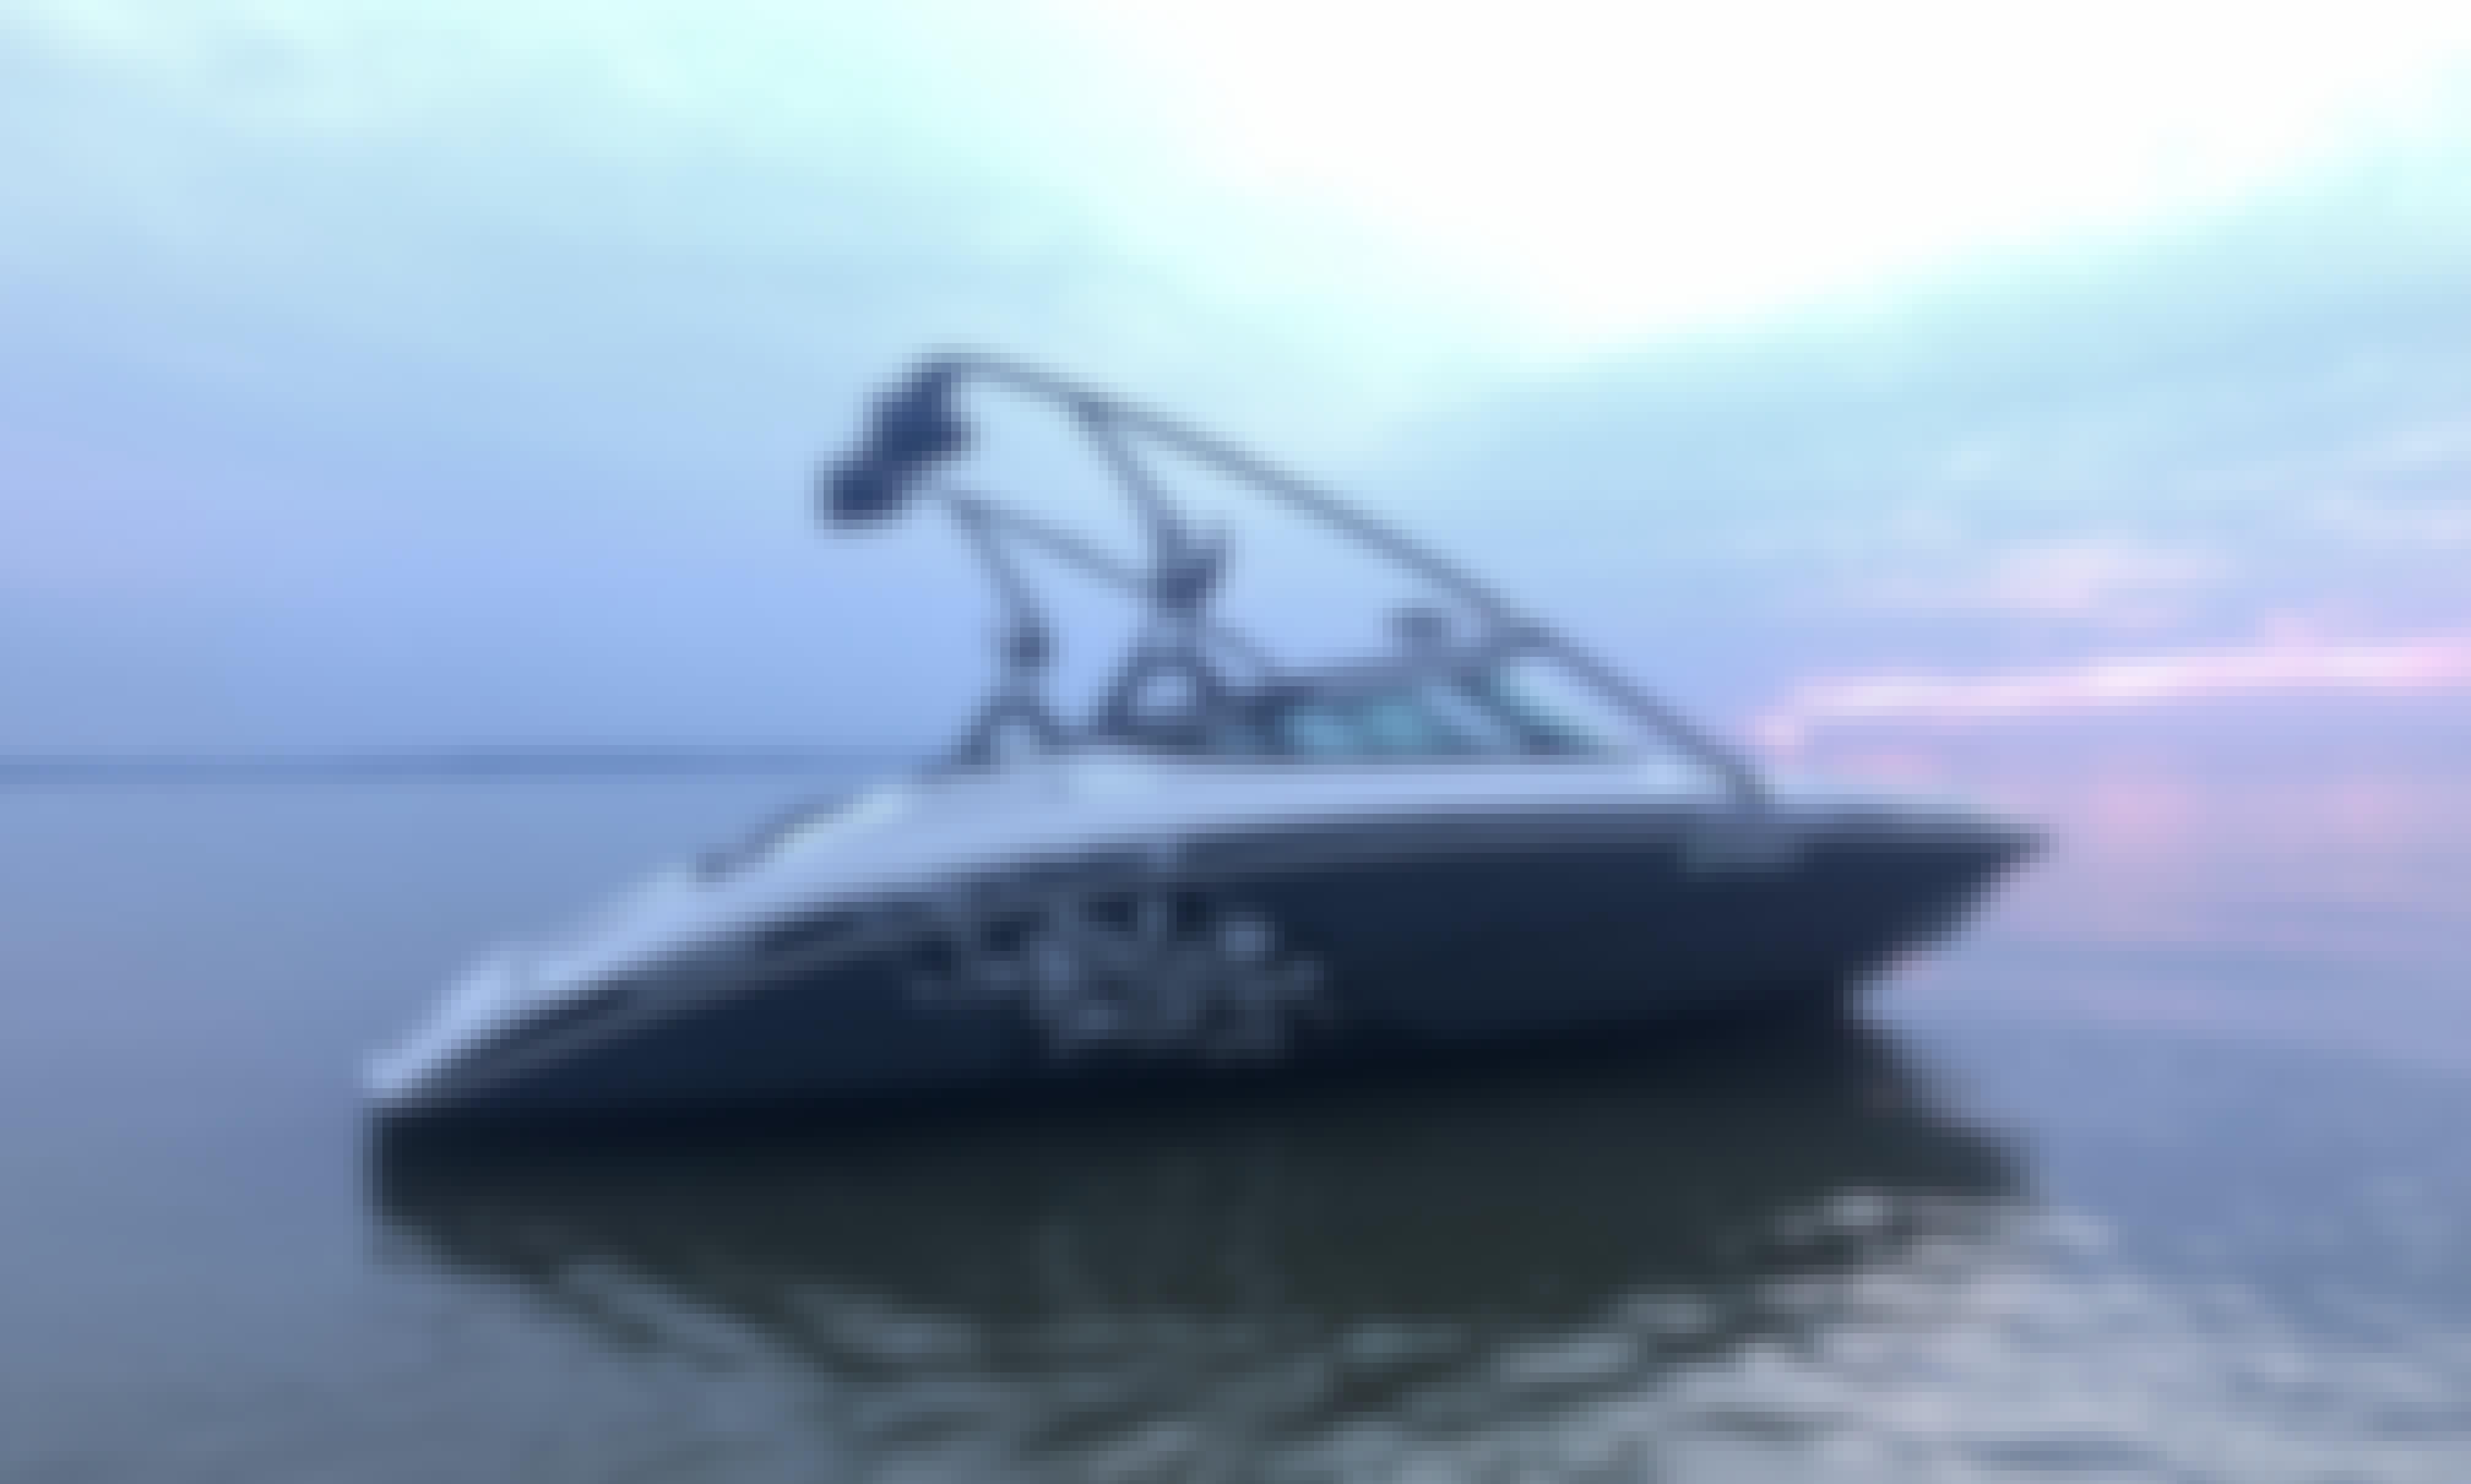 Wakeboarding on Lake Livingston in Texas